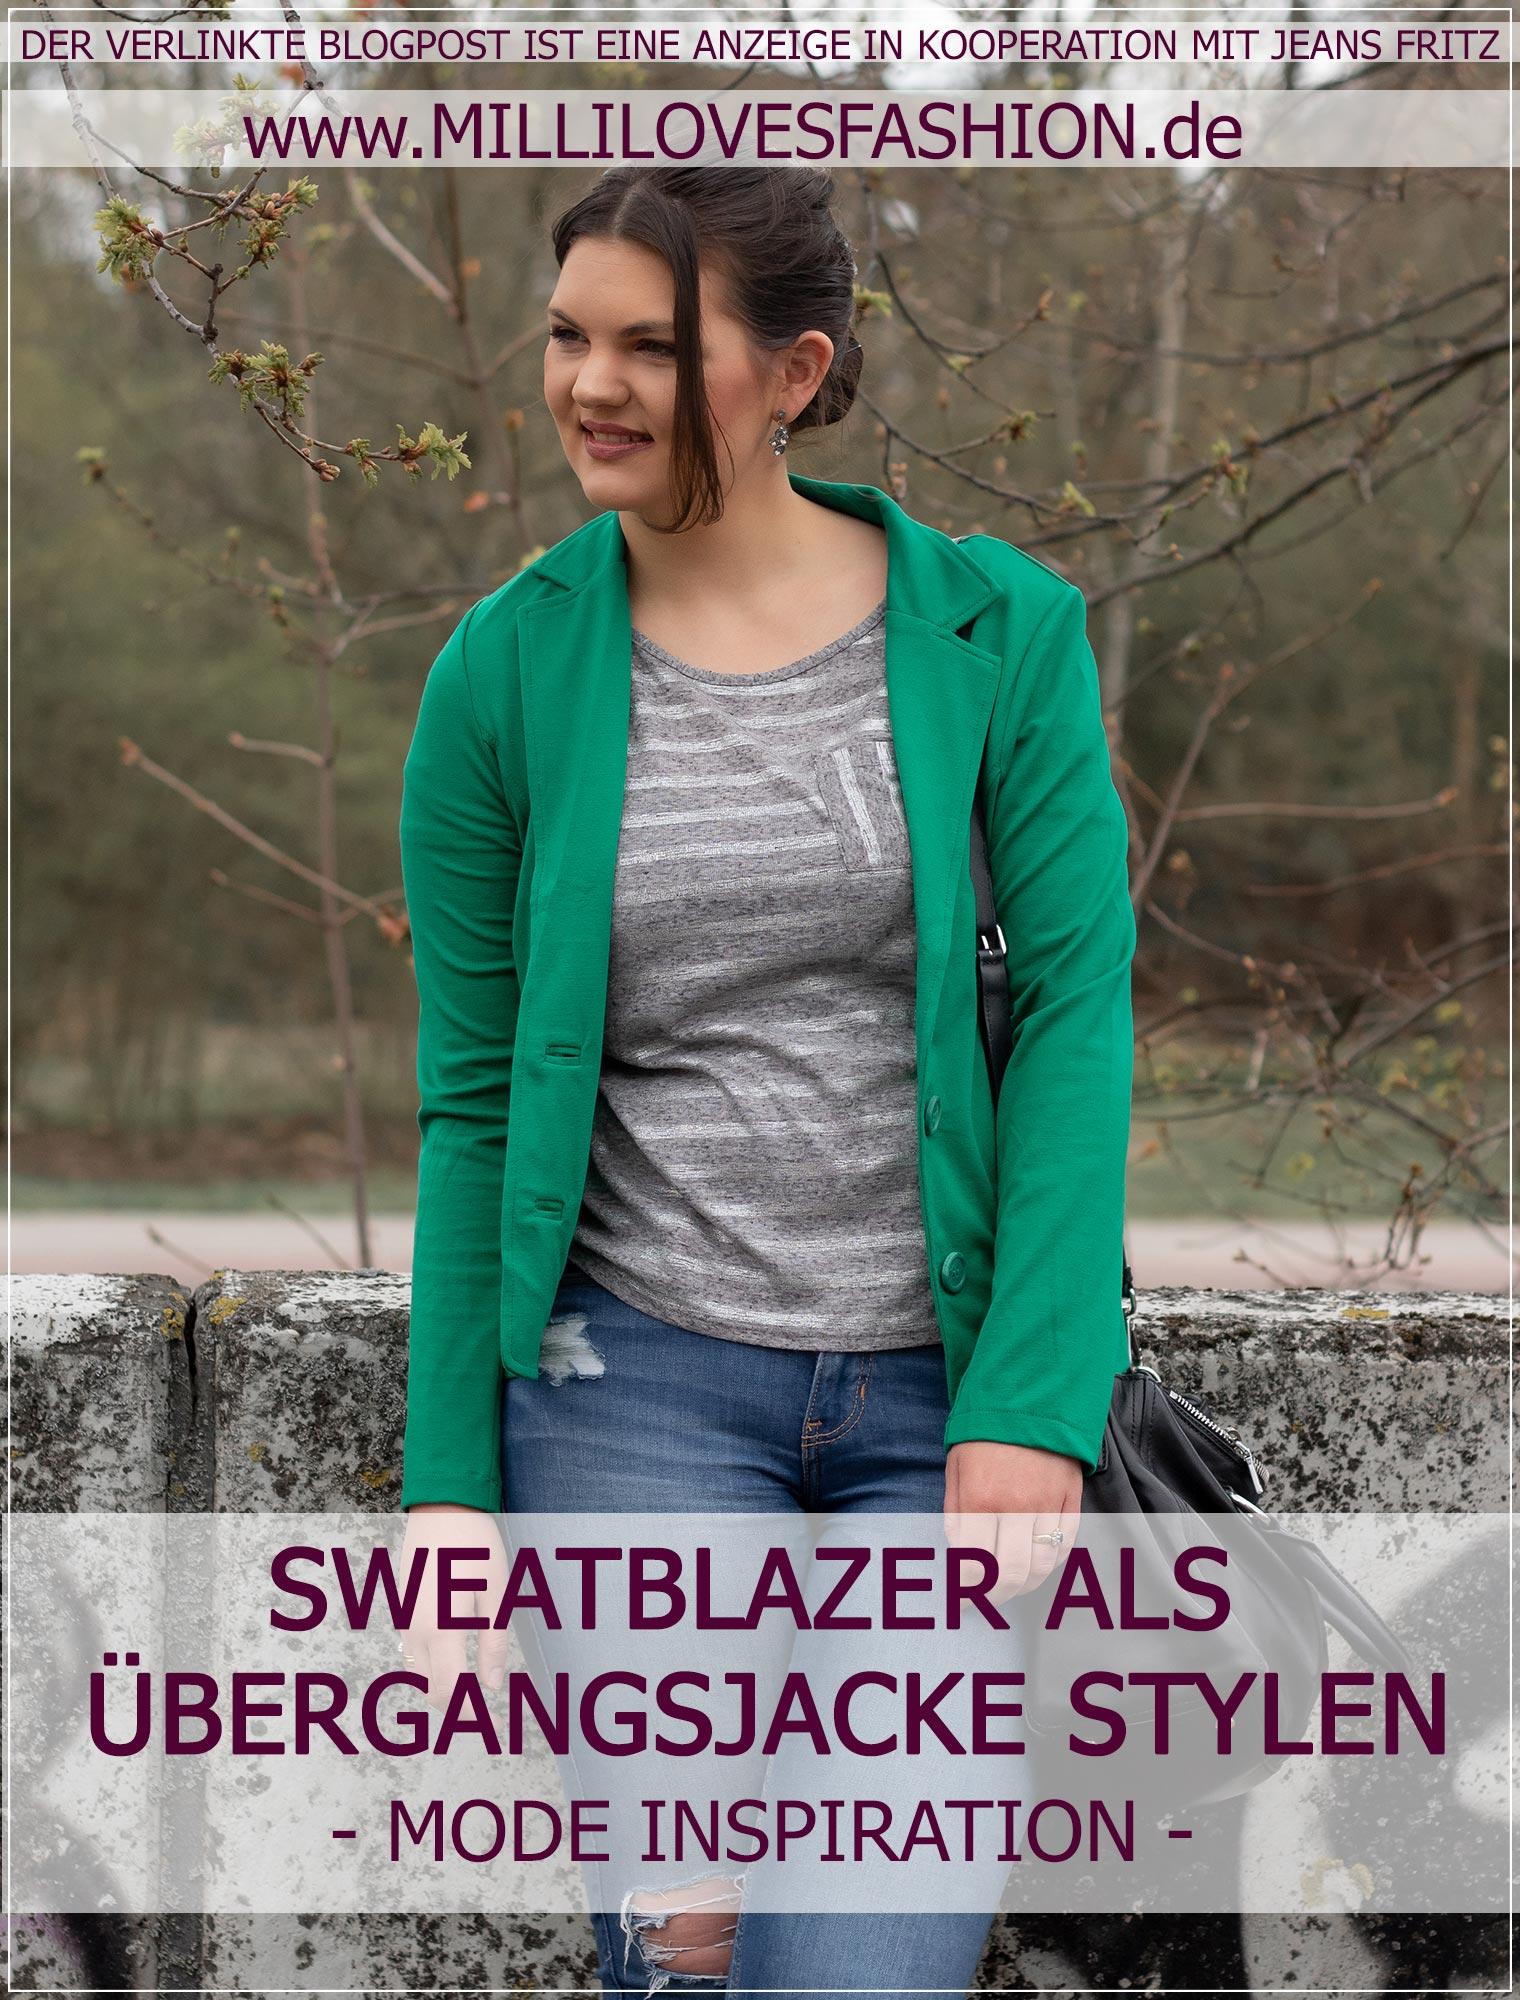 Sweatblazer als Übergangsjacke im Frühling stylen